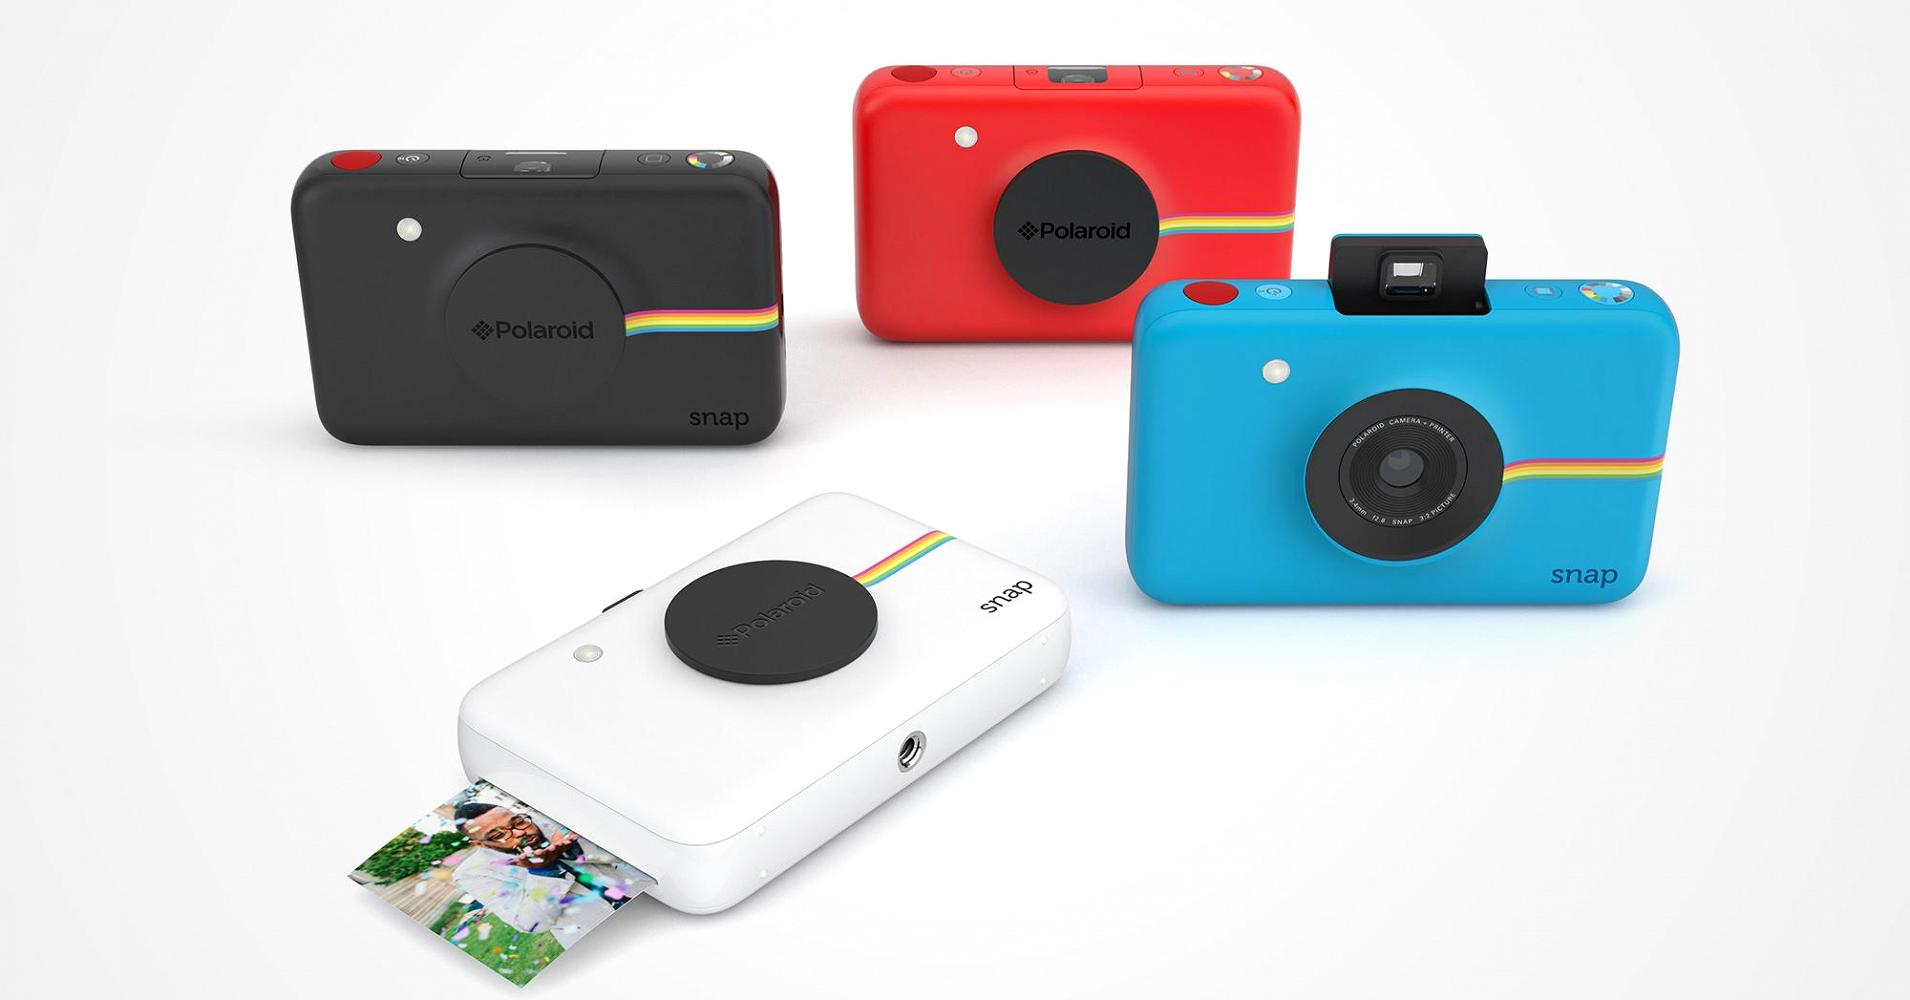 102969396-PolaroidSnap_01-1.1910x1000